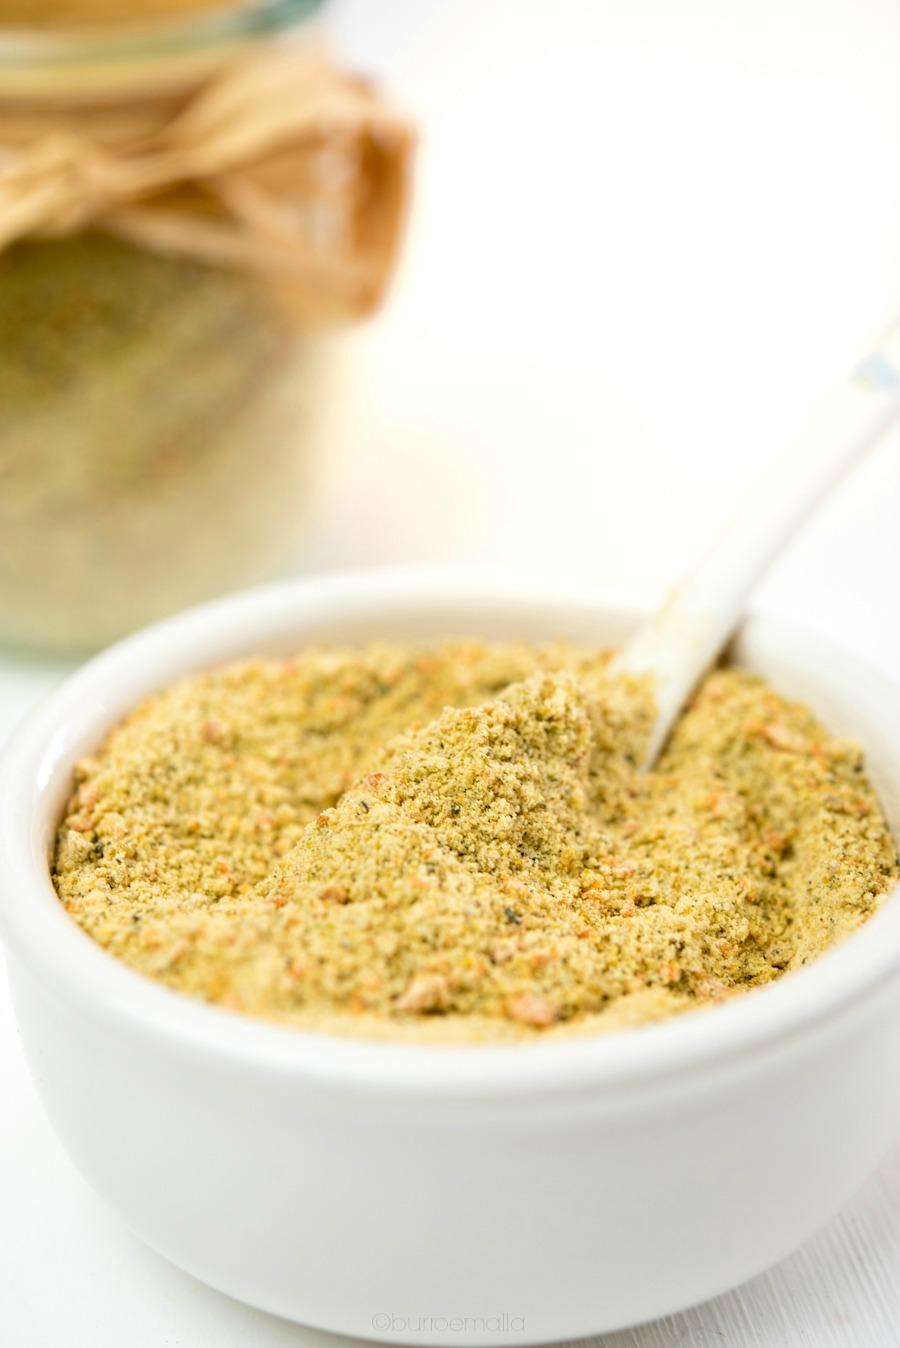 dado granulare vegetale e senza glutine